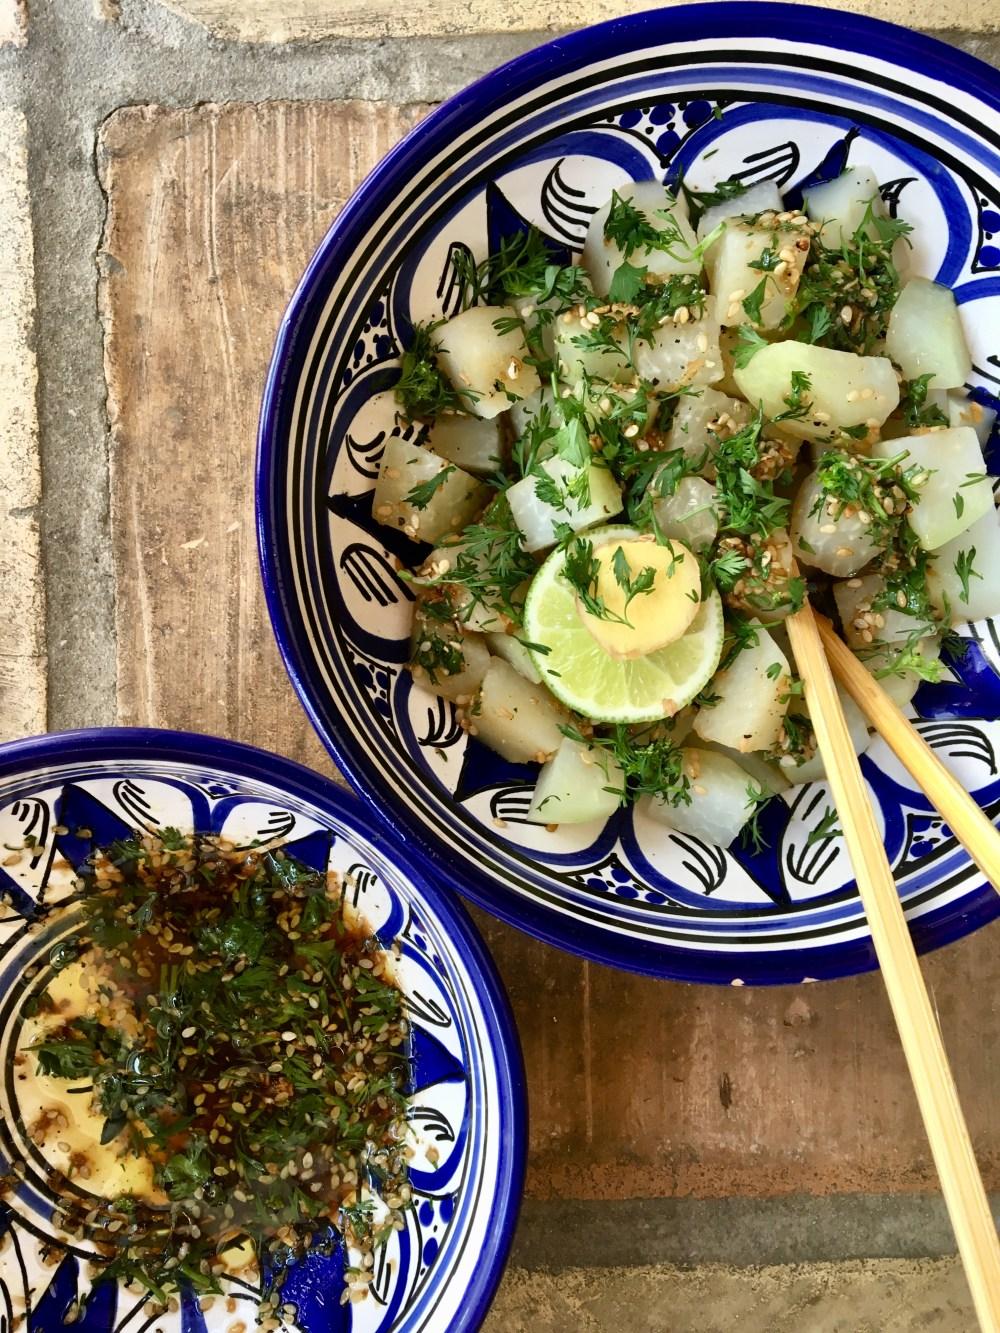 Kohlrabi asiatisch - Als Salat oder Gemüsebeilage